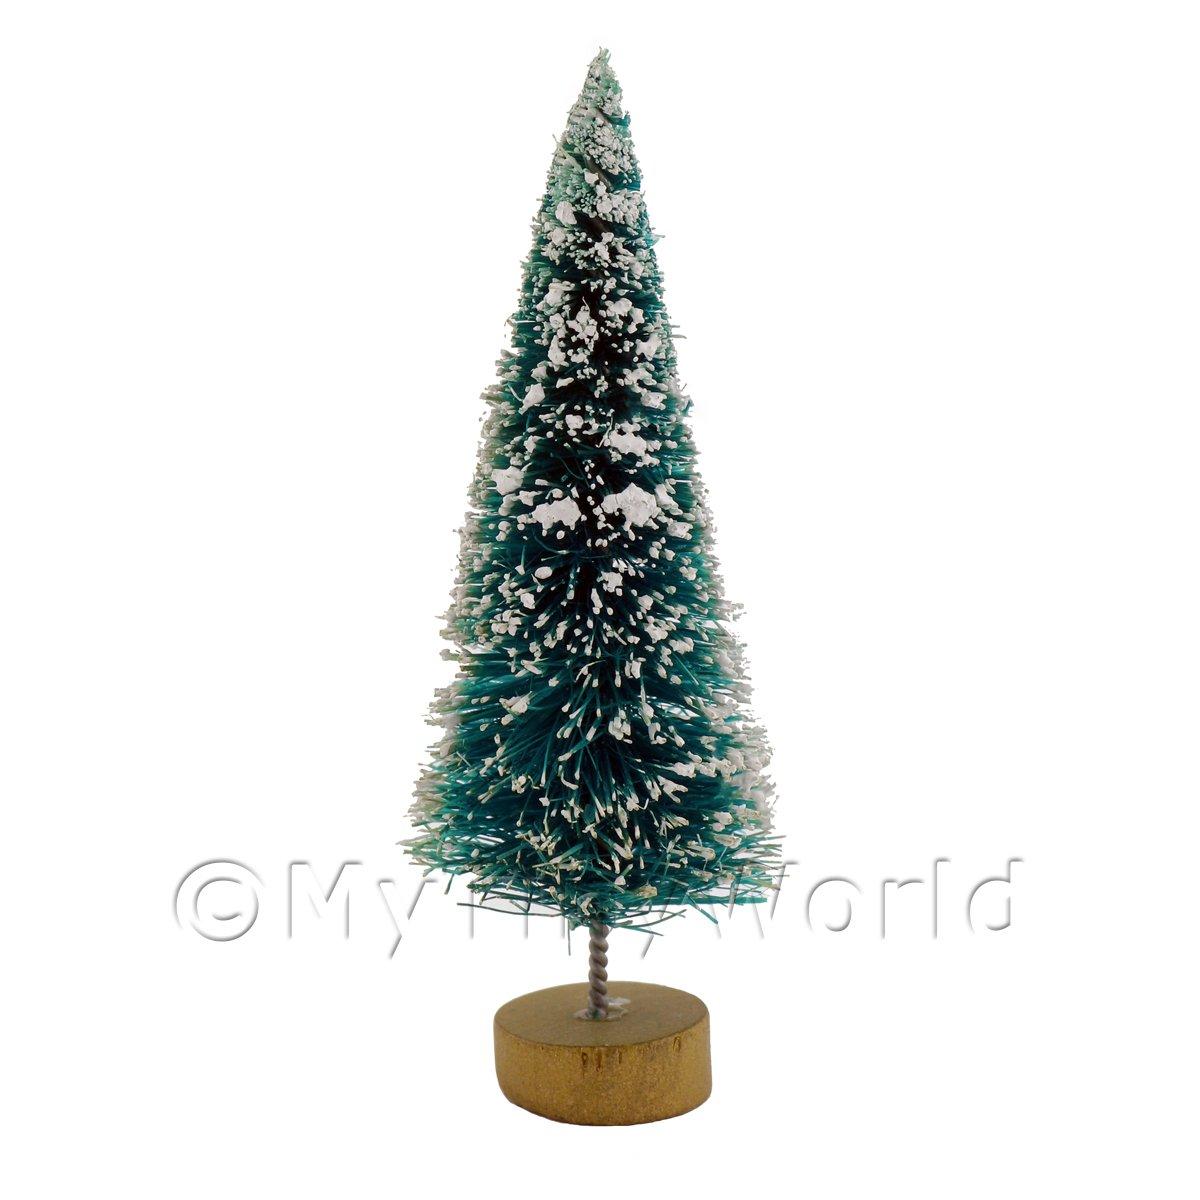 dolls house miniature small christmas tree with snow - Miniature Christmas Decorations Uk